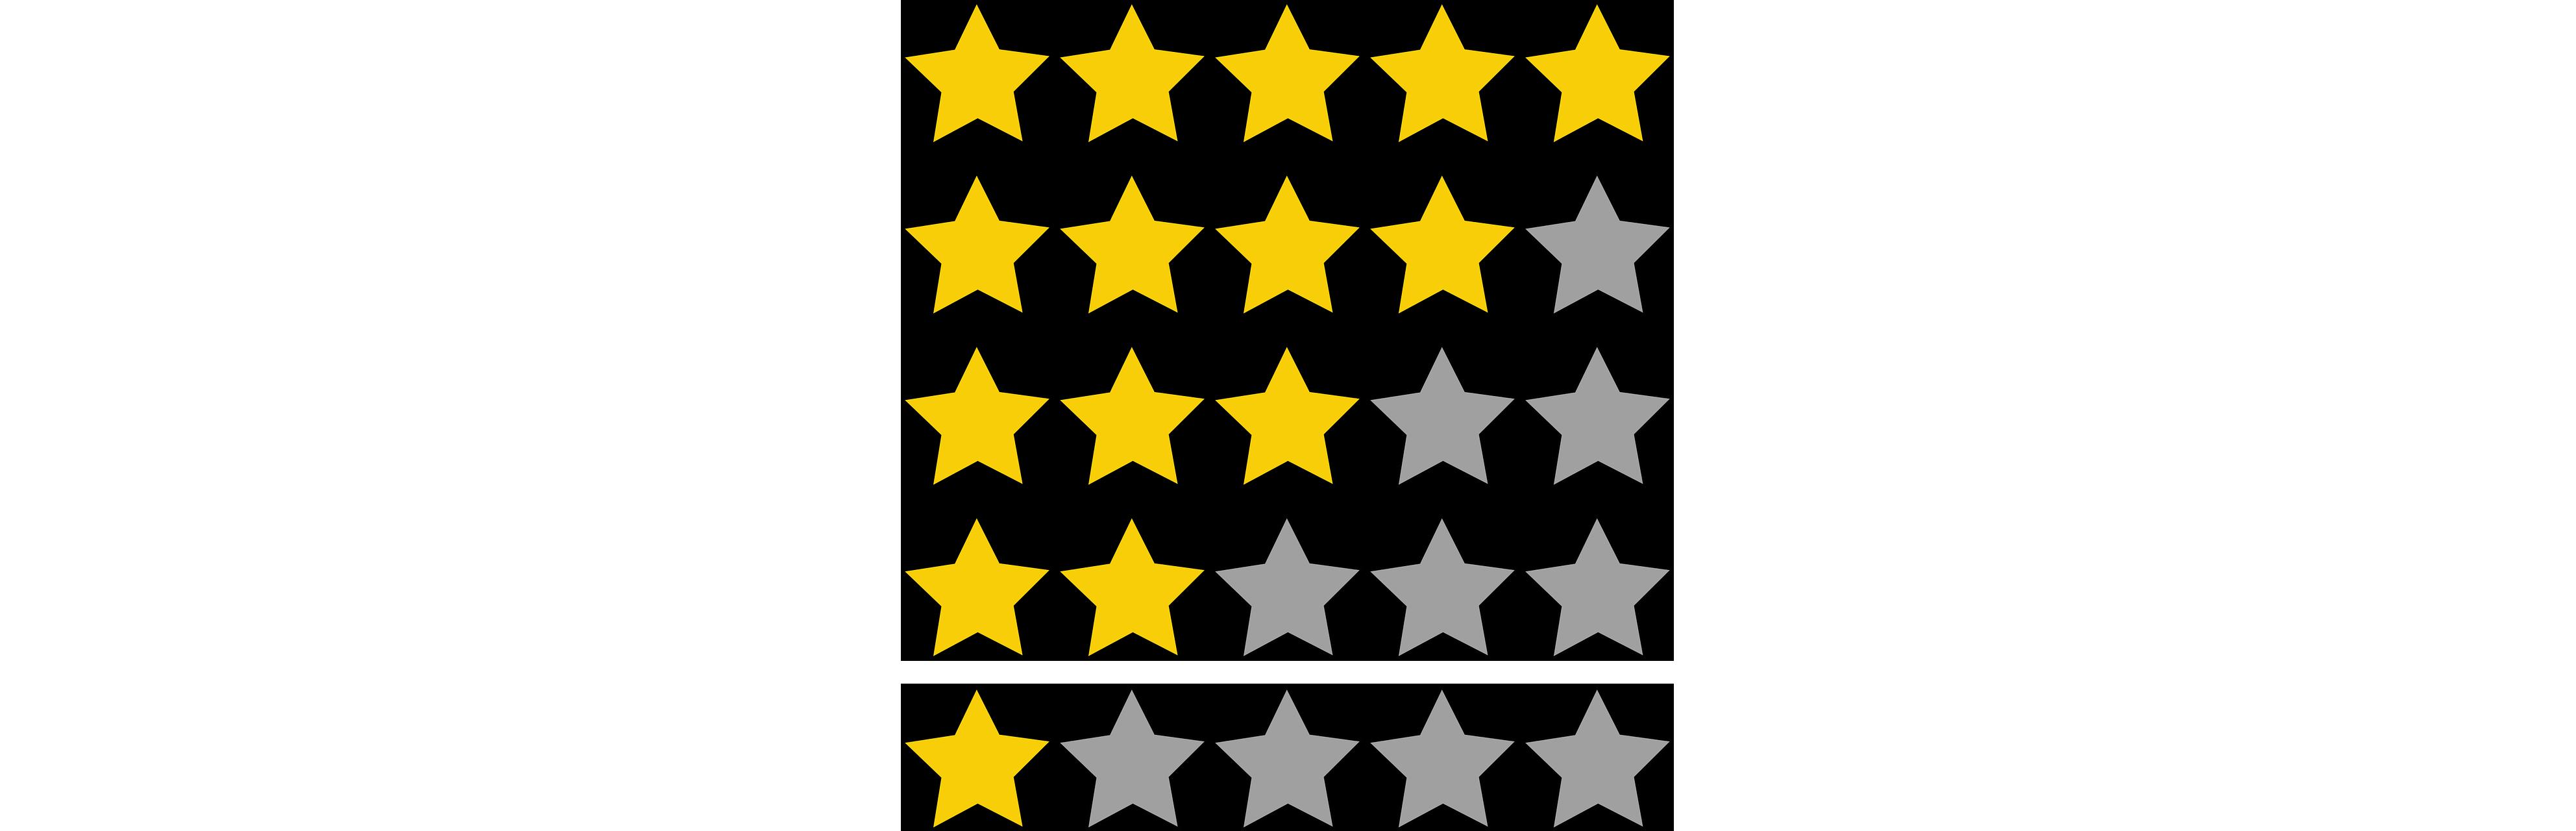 voto por estrellas